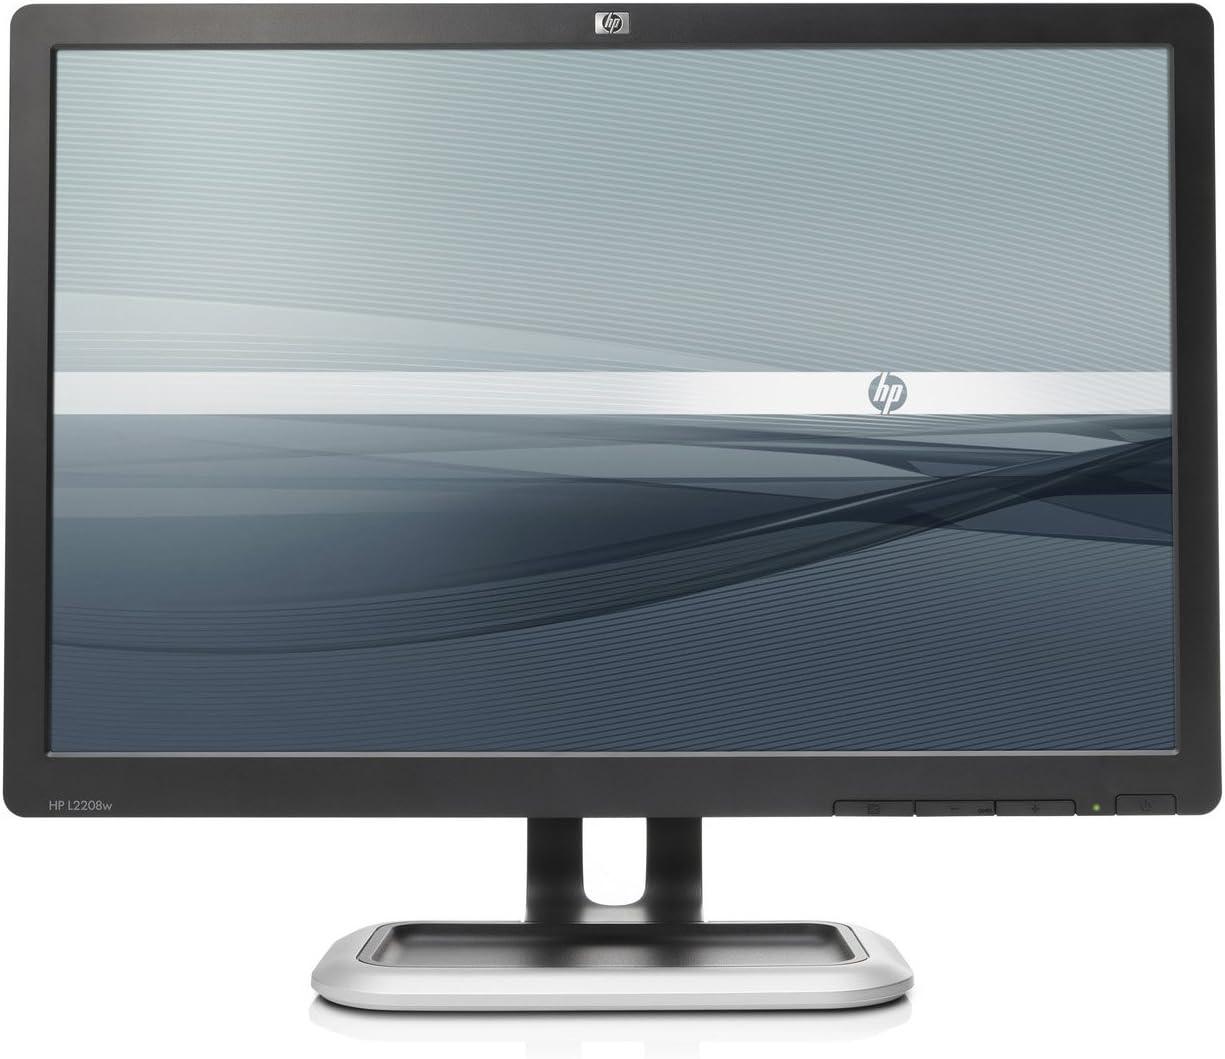 HP L2208w 22-inch Widescreen LCD Monitor